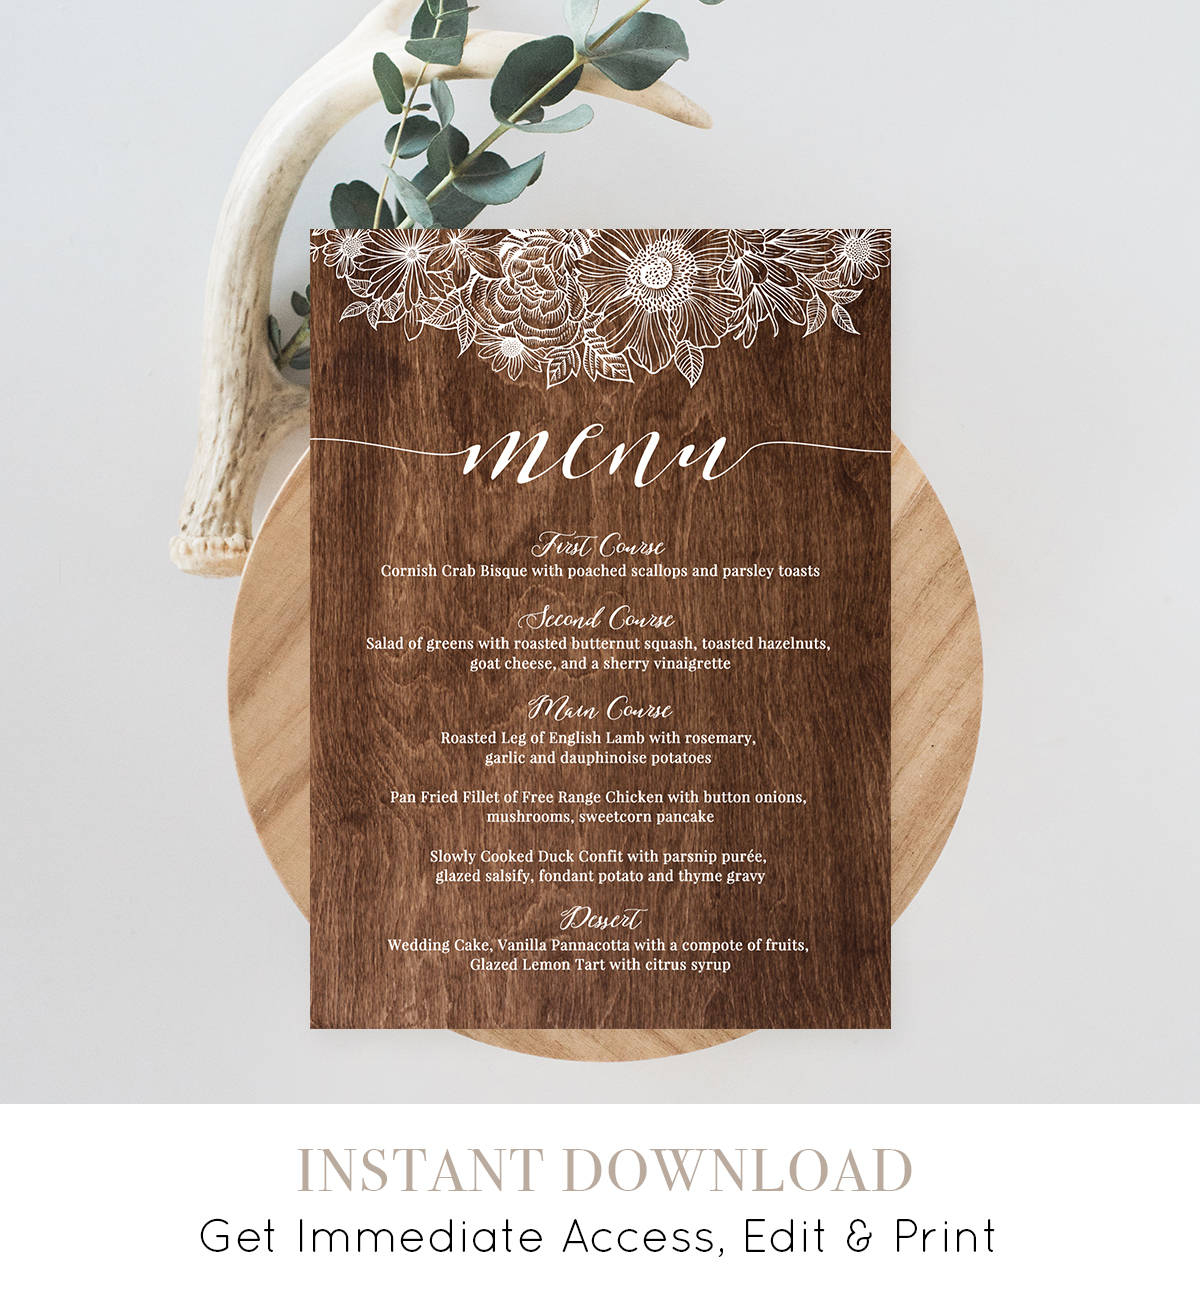 Menu Card Template, Printable Wedding Menu, Fully Editable, Instant - Free Printable Wedding Menu Card Templates